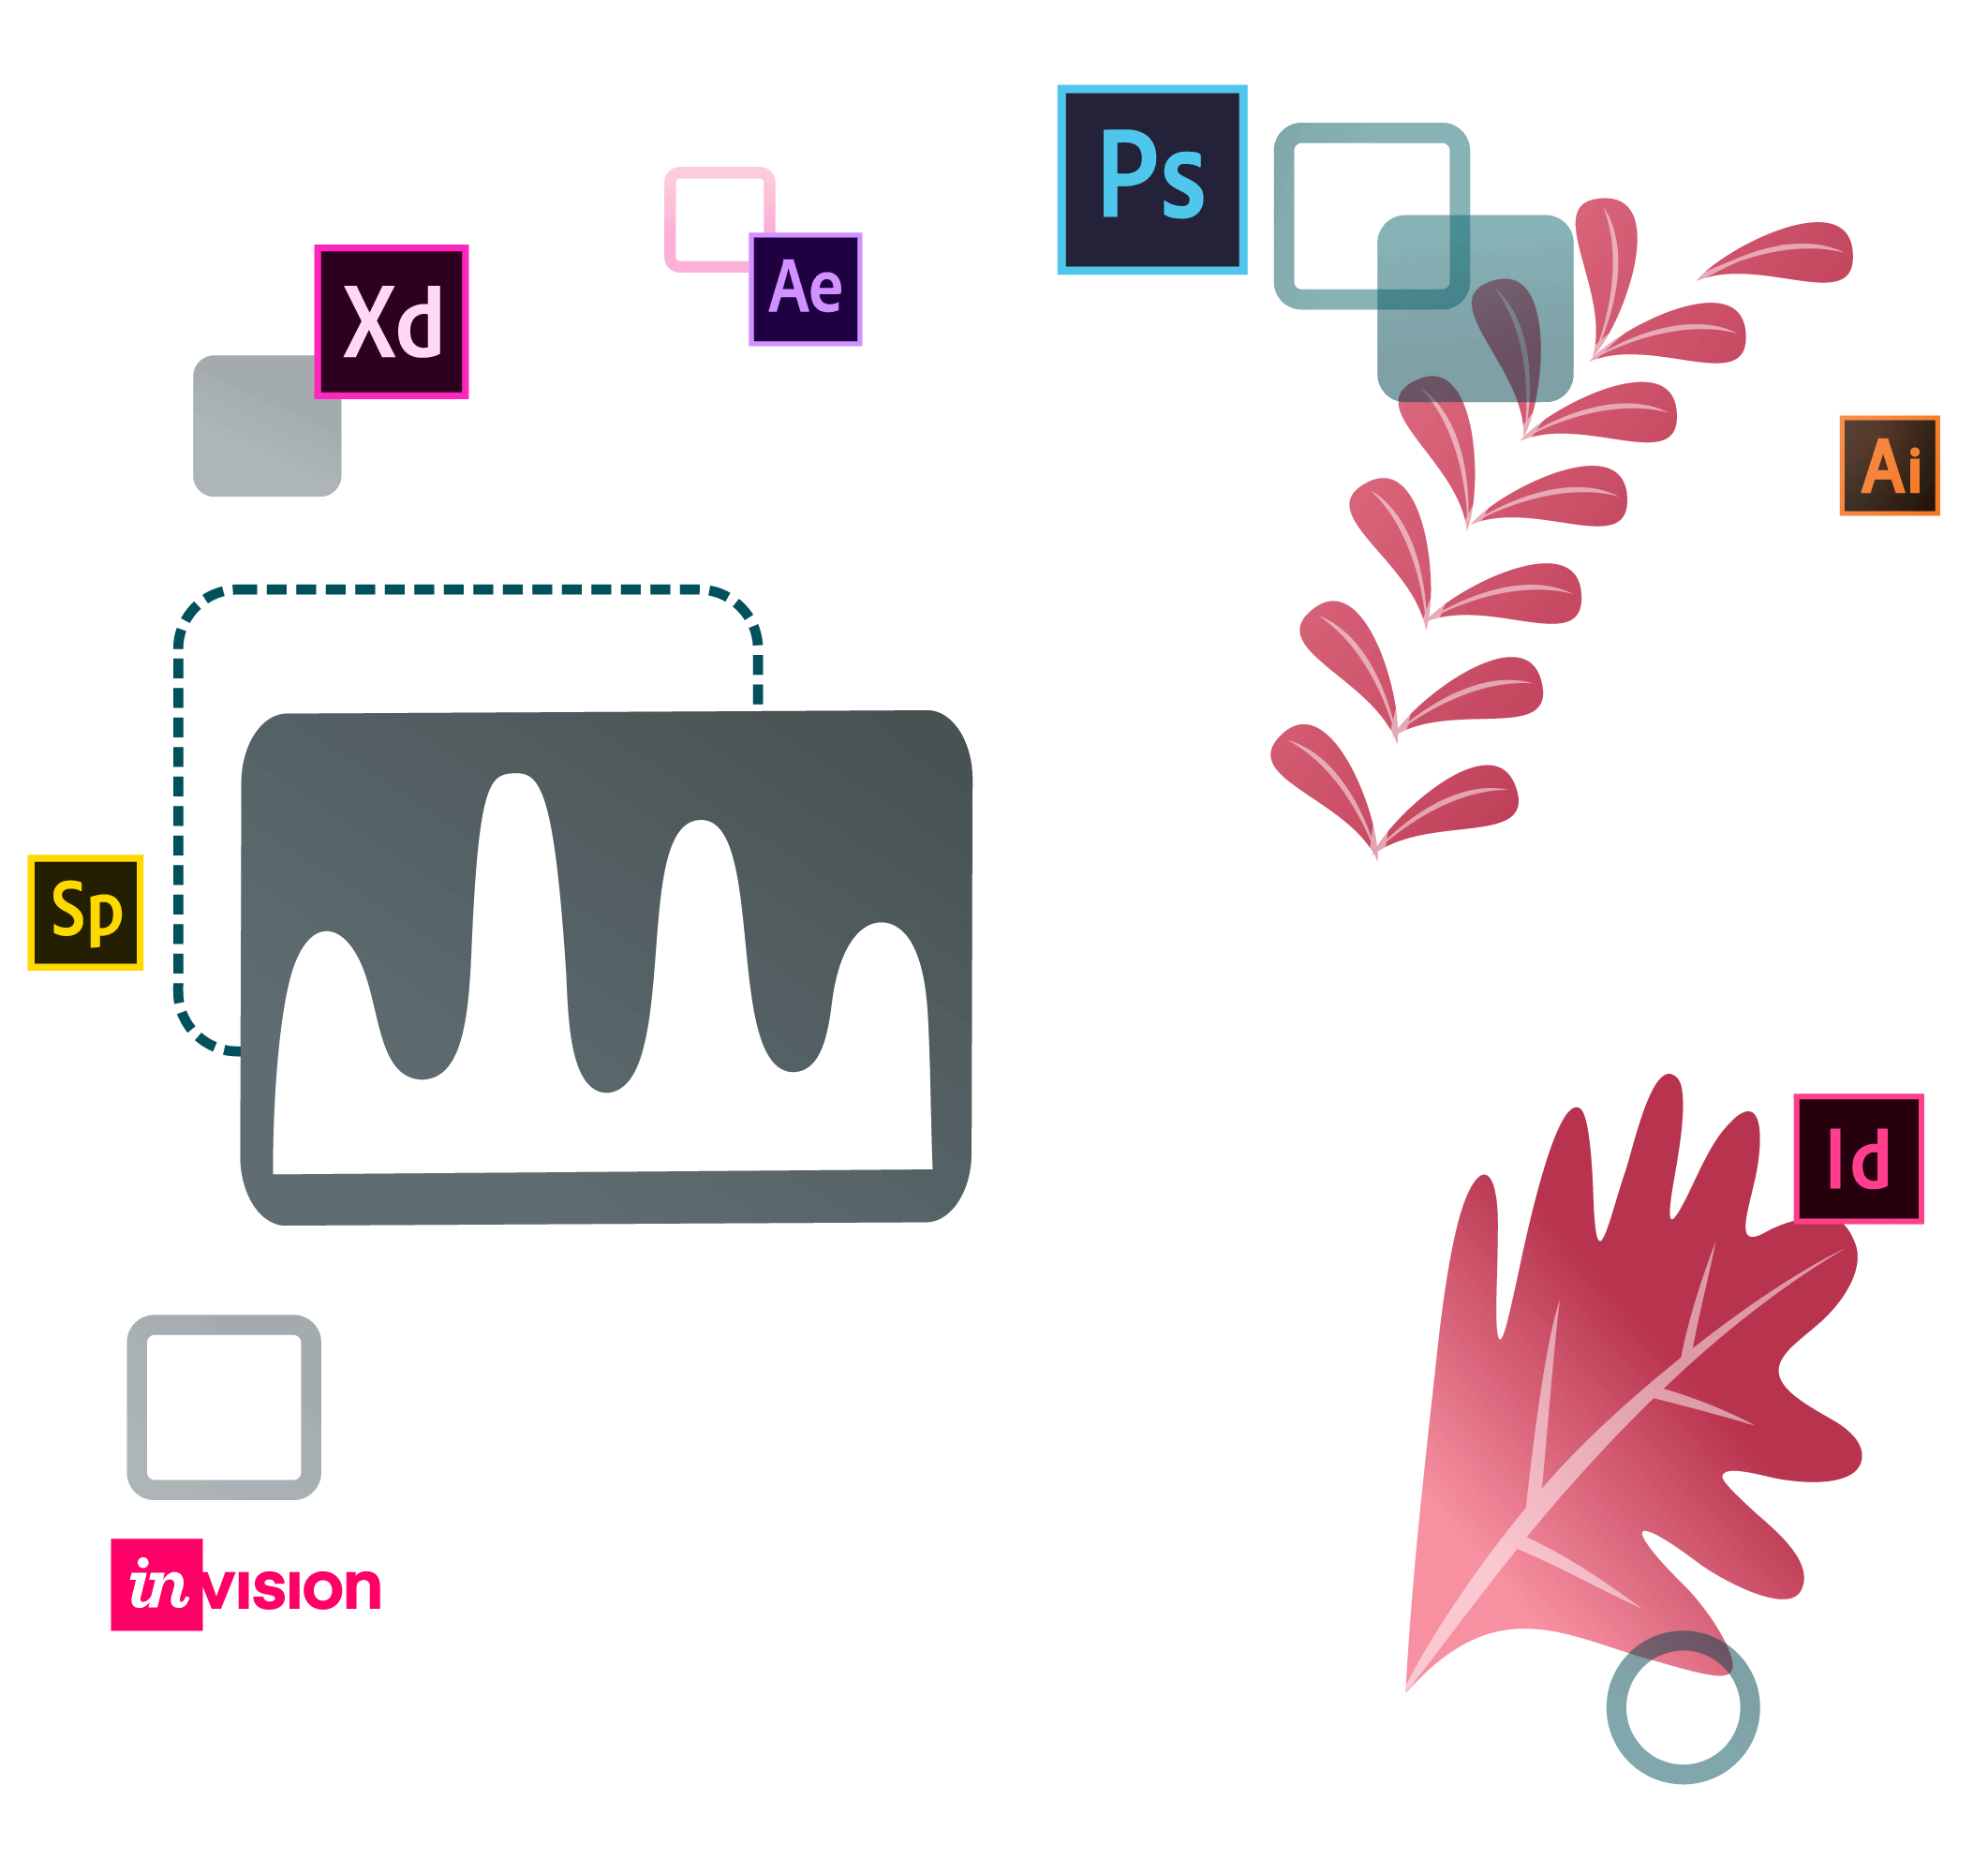 web design company, responsive web design, social media post design, adobe photoshop, adobe illustrator